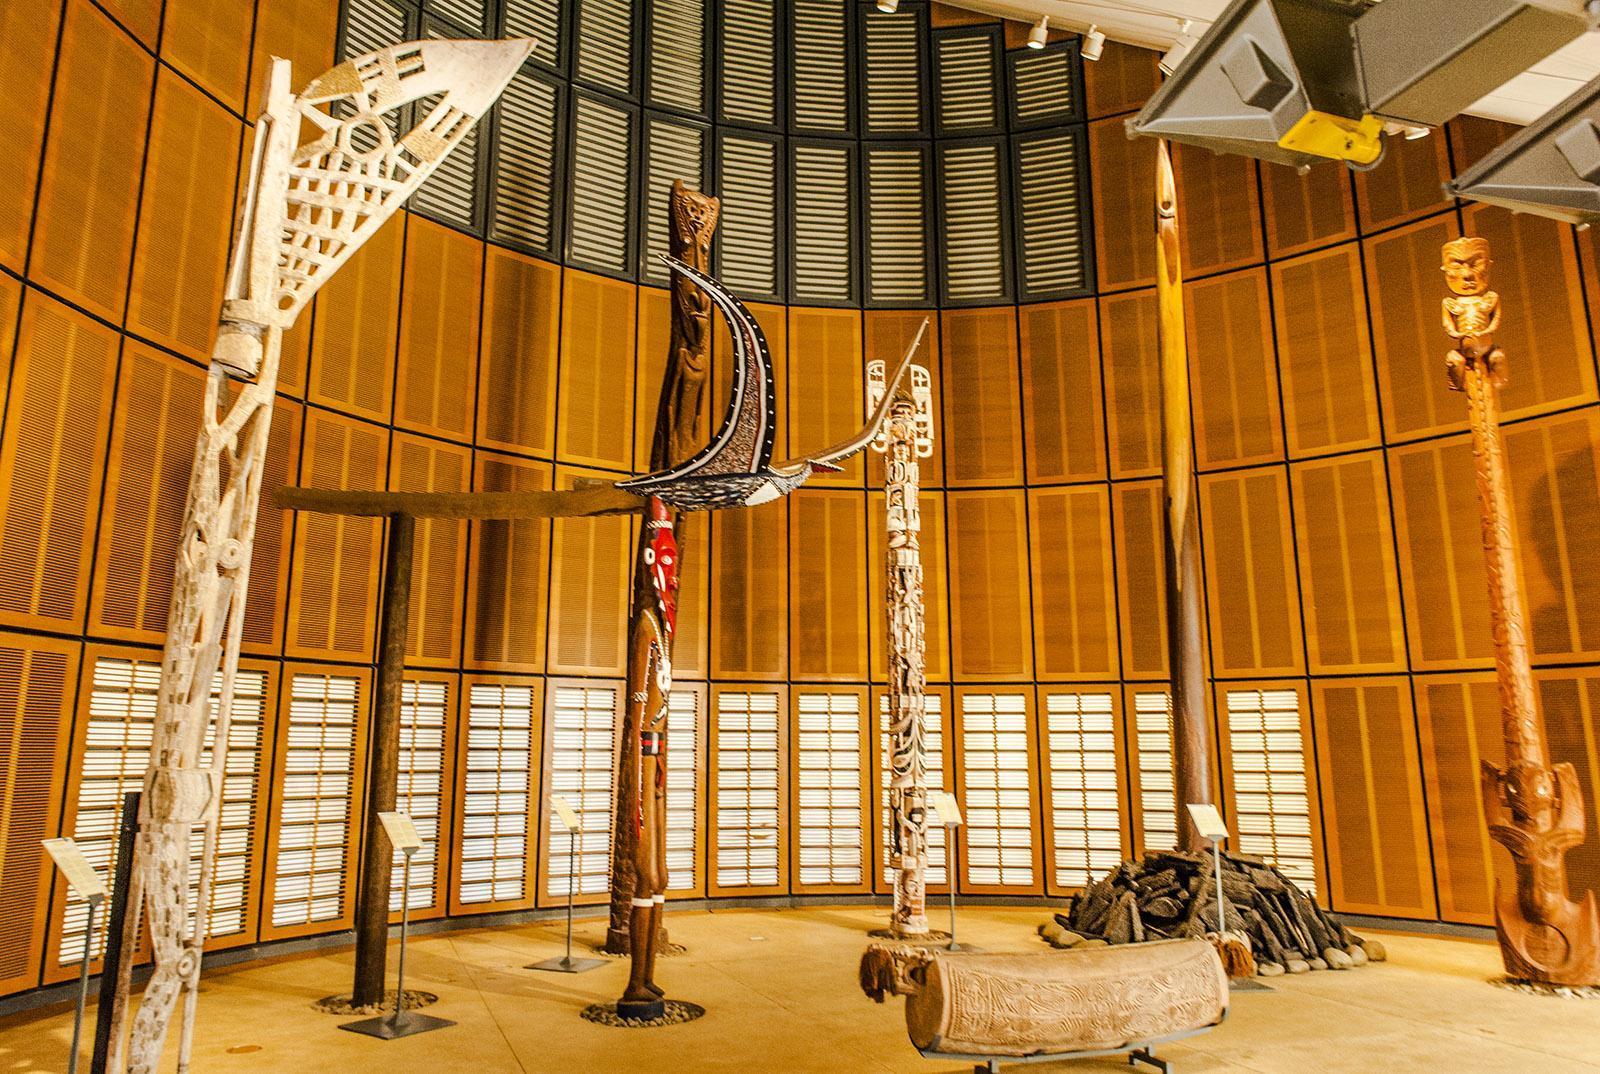 Nouméa: Ausstellung in der 1. case des Tjibaou-Kulturzentrums. Foto: Hilke Maunder